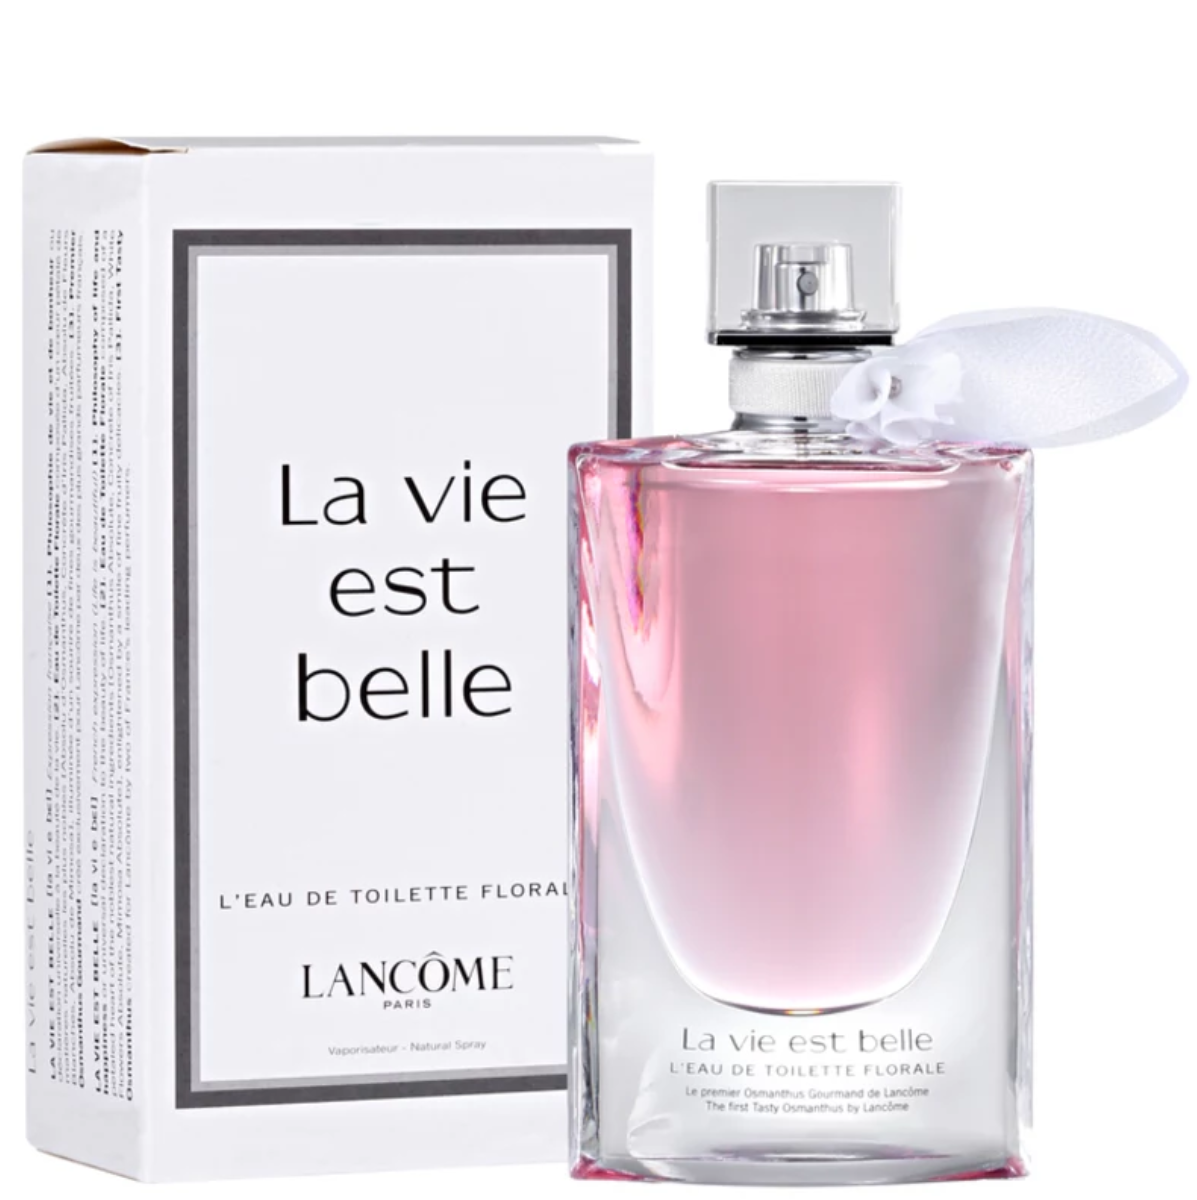 Lancome La Vie Est Belle Florale Perfume La Vie Est Belle La Vie Est Belle La Vie Est Belle Lancome Perfume Fragancia Locion Corporal